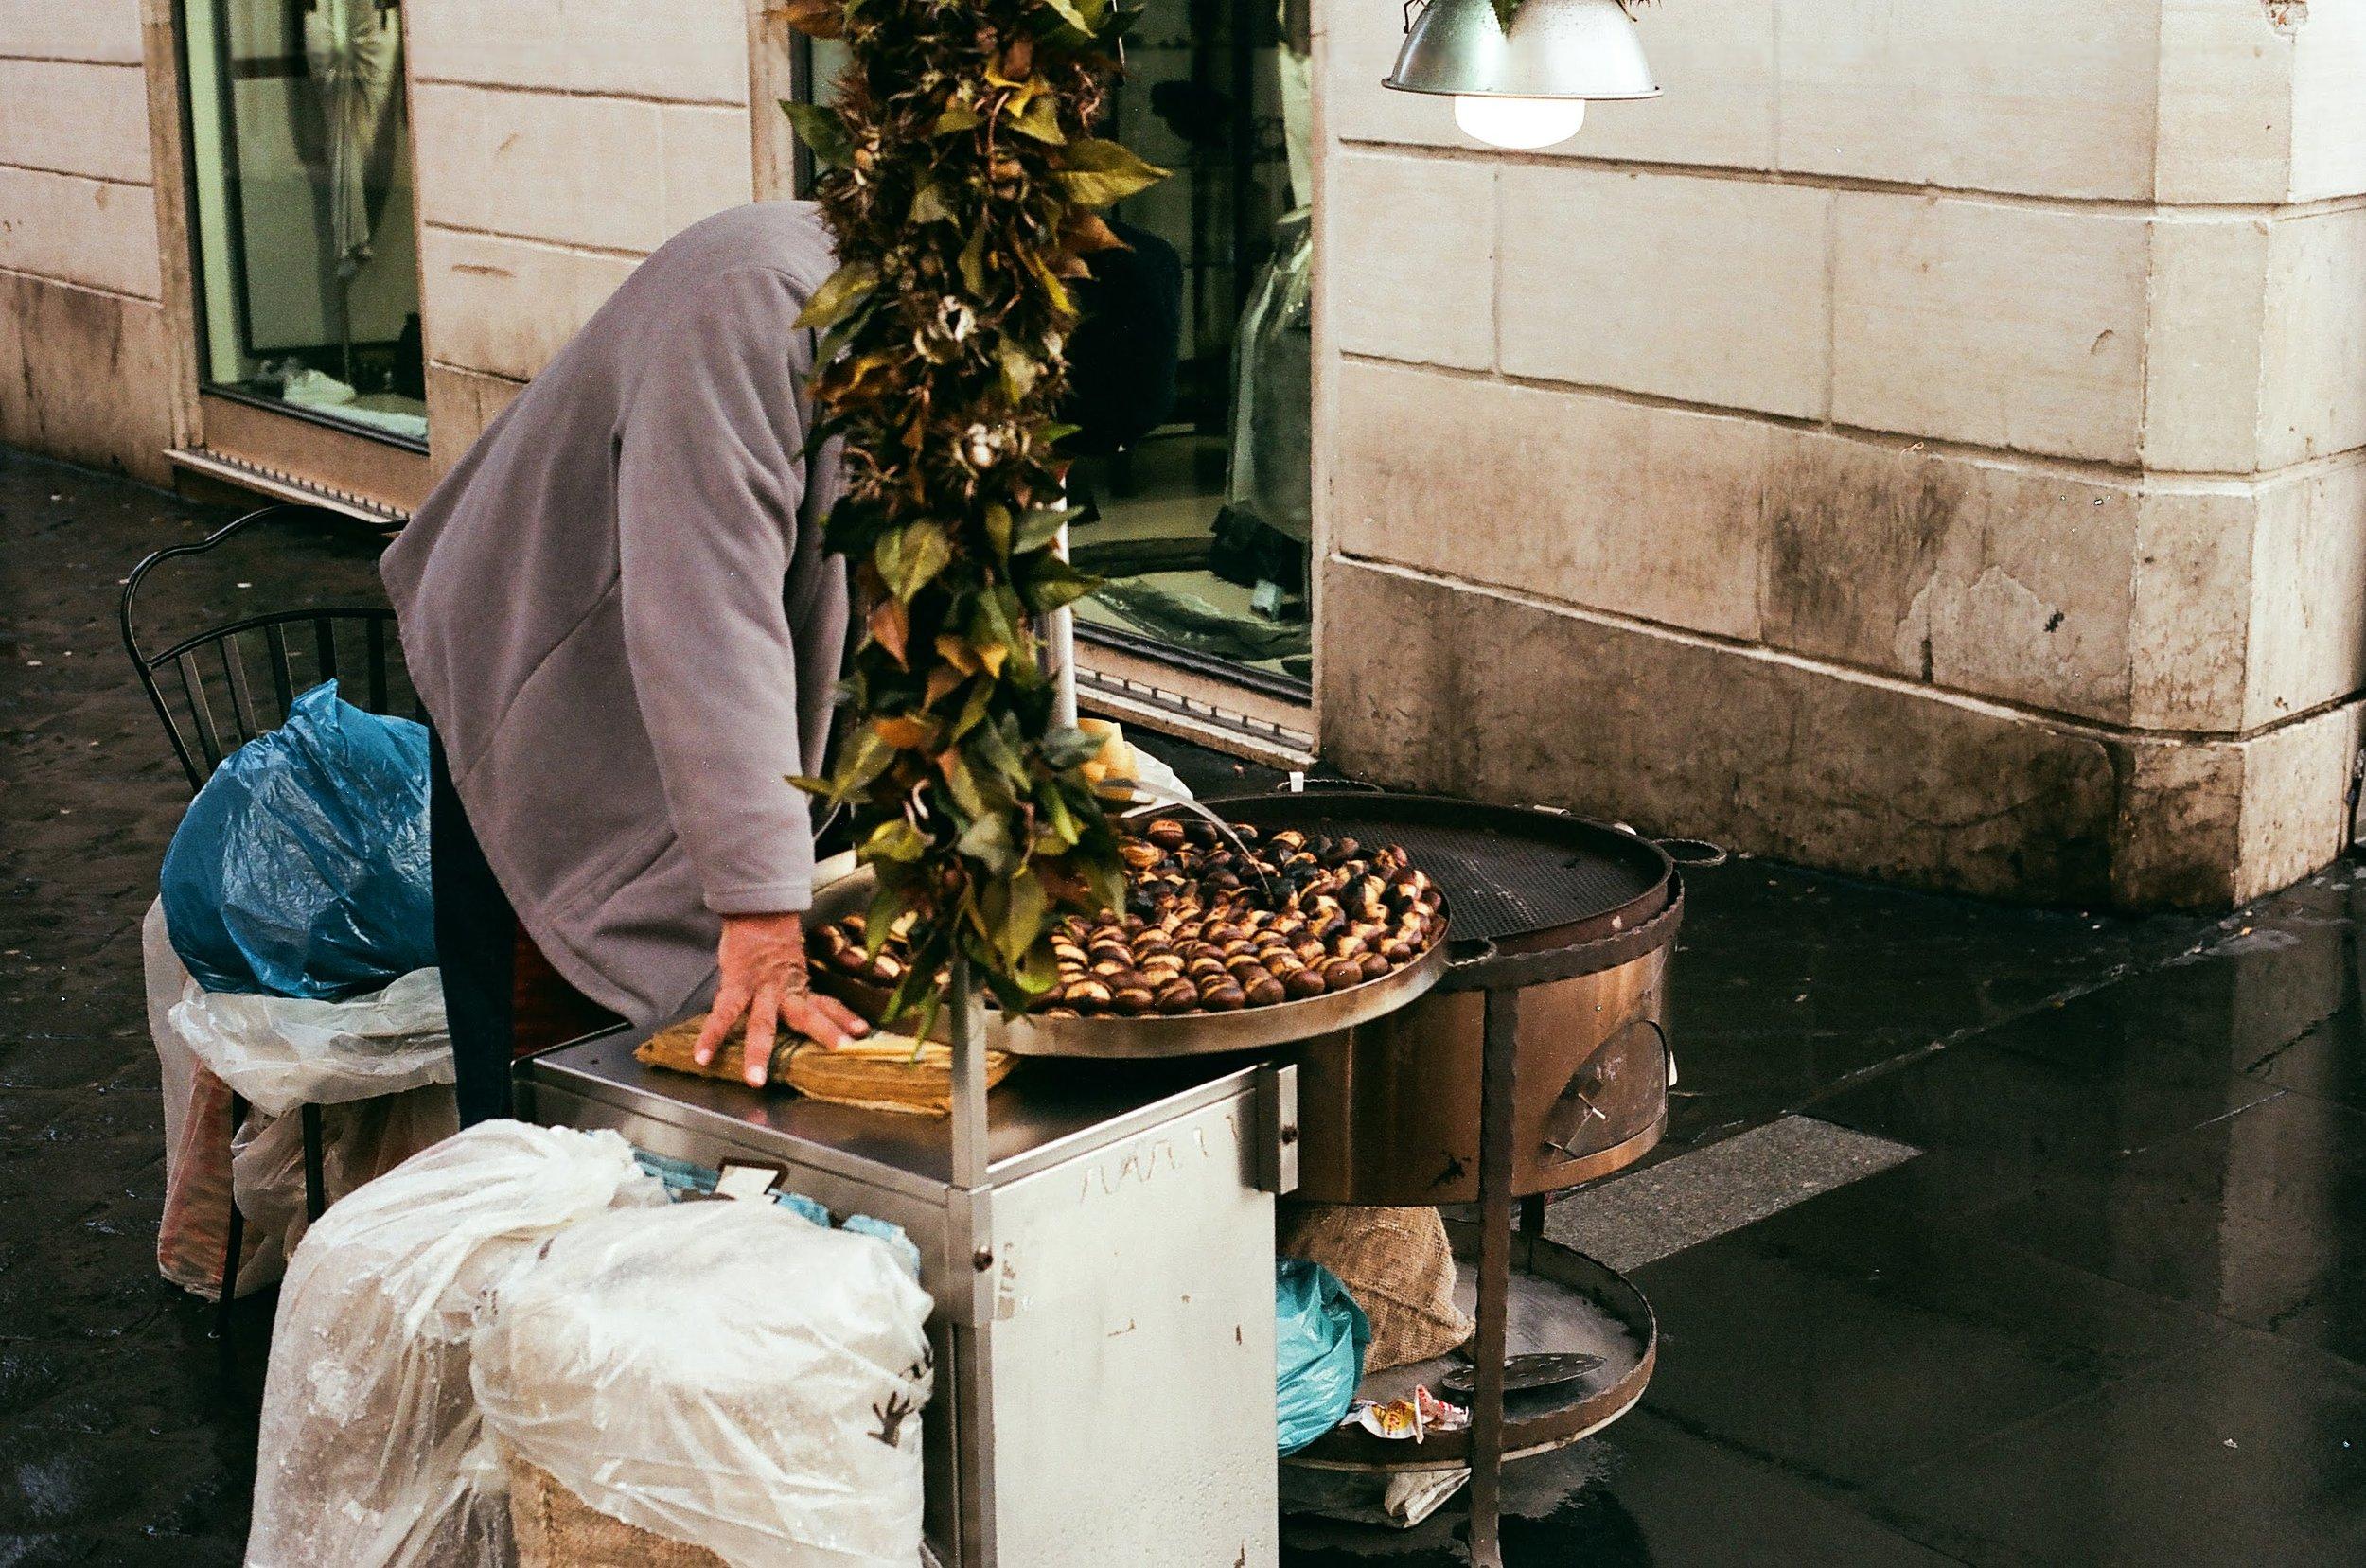 Rome-film-34.jpg